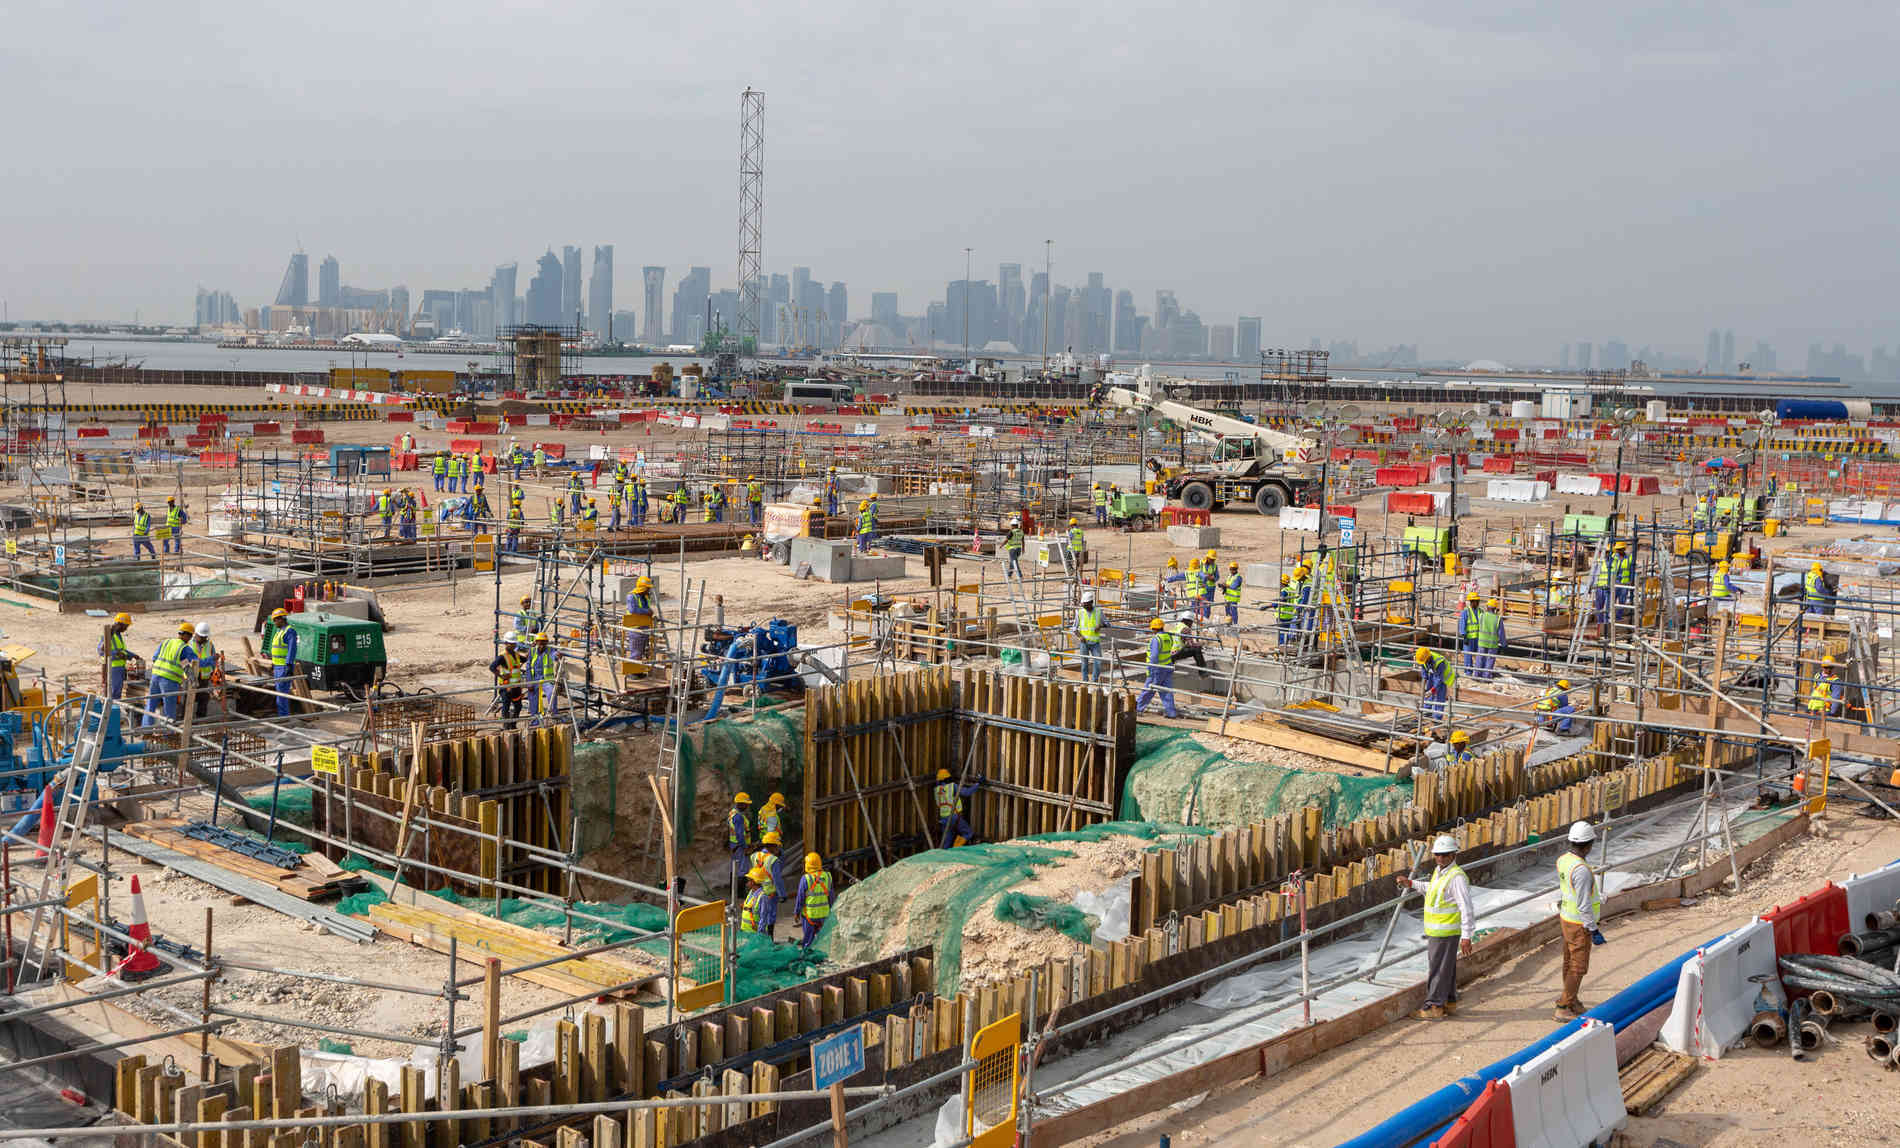 Fussball Wm 2022 In Katar Wie Das Kafala System Ausbeutung